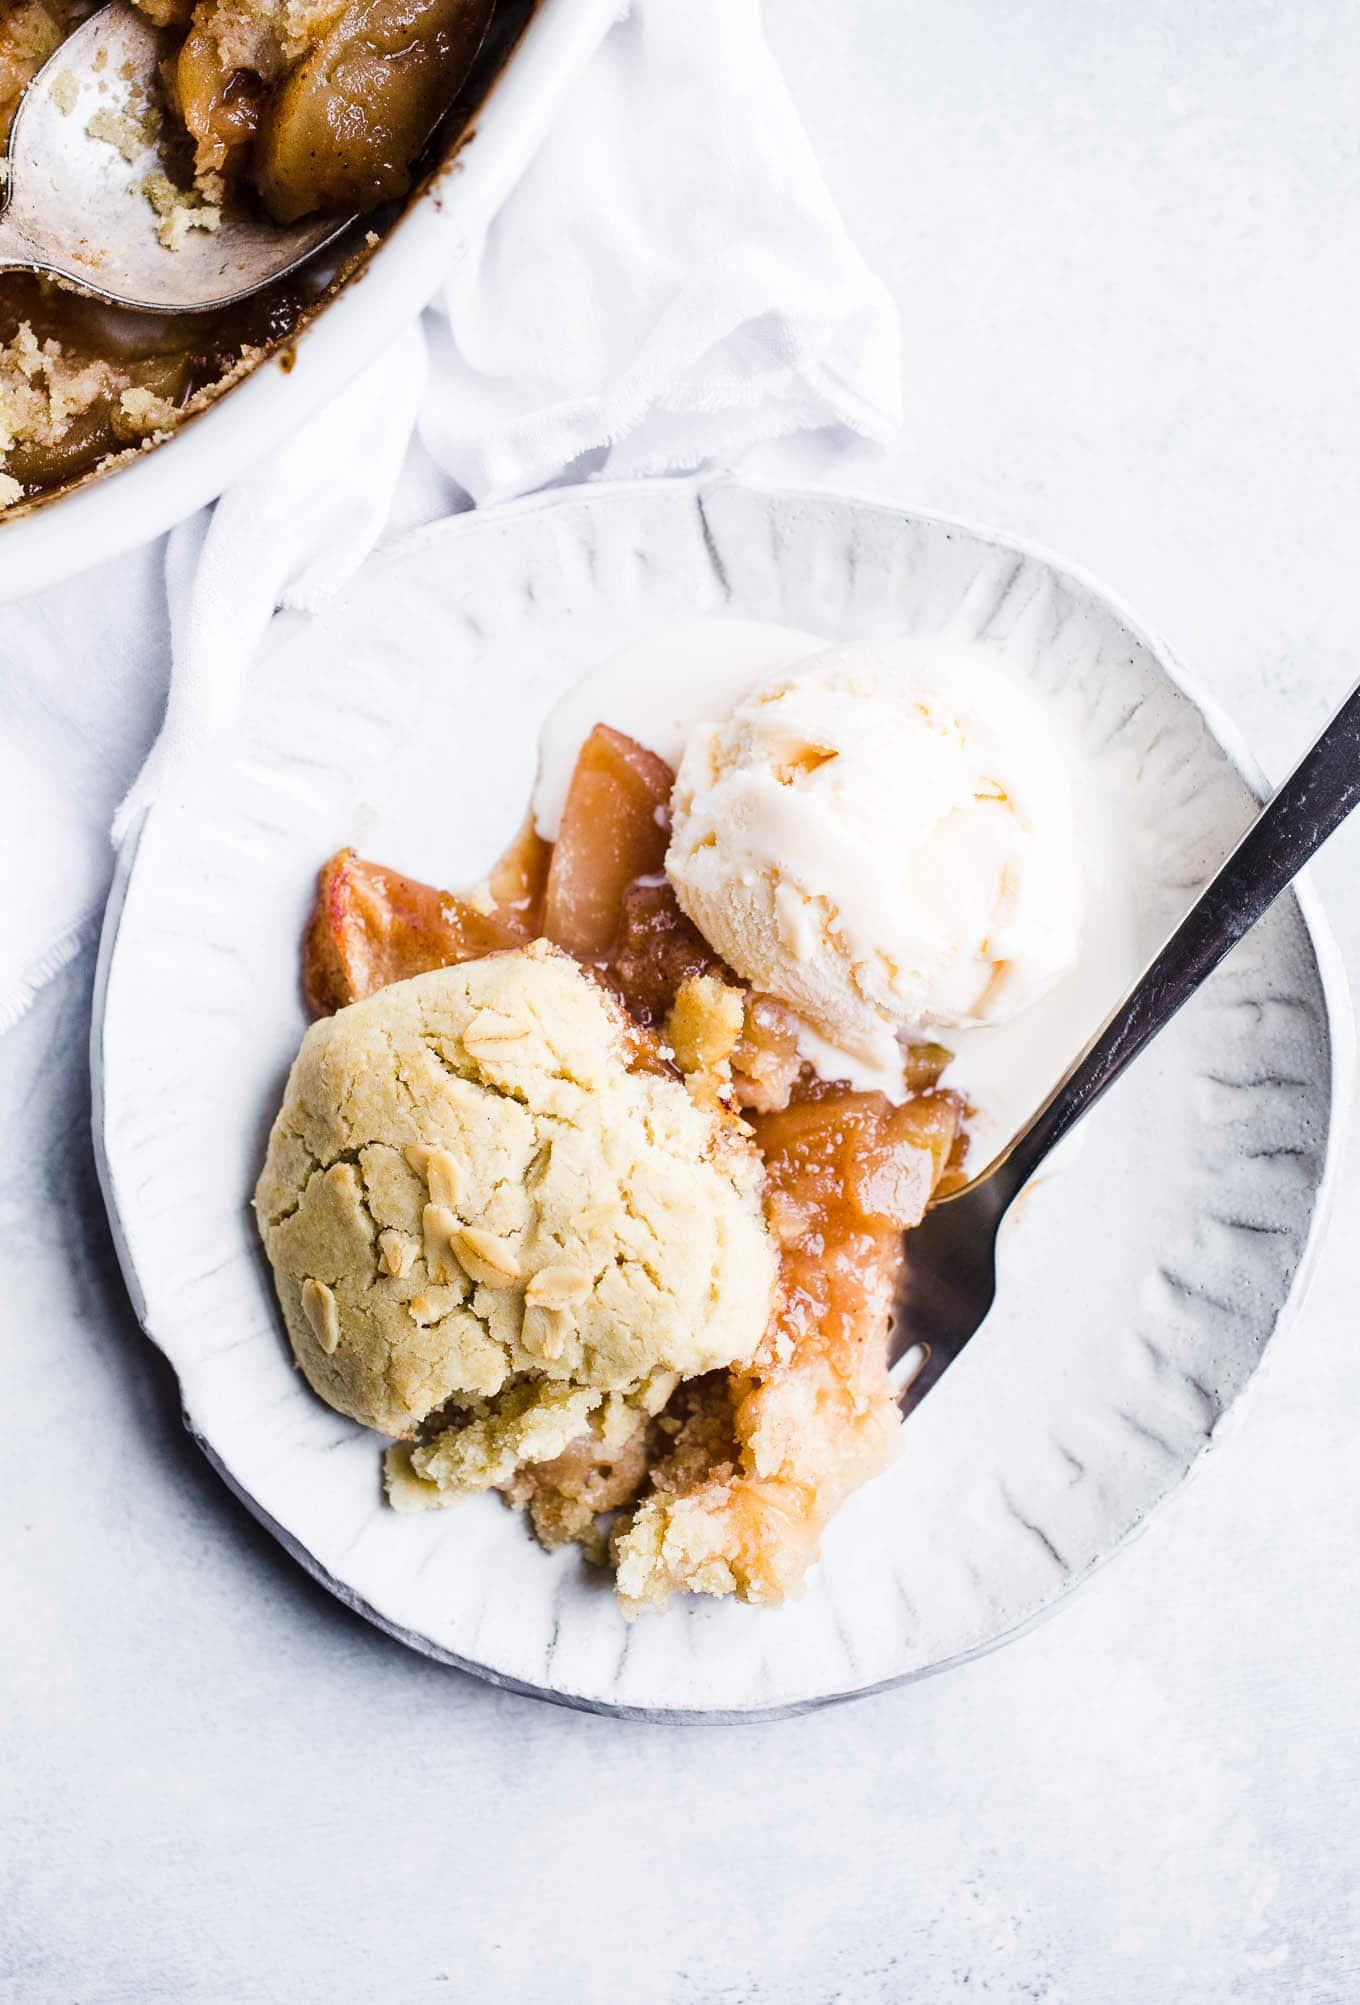 Apple Cobbler with ice cream